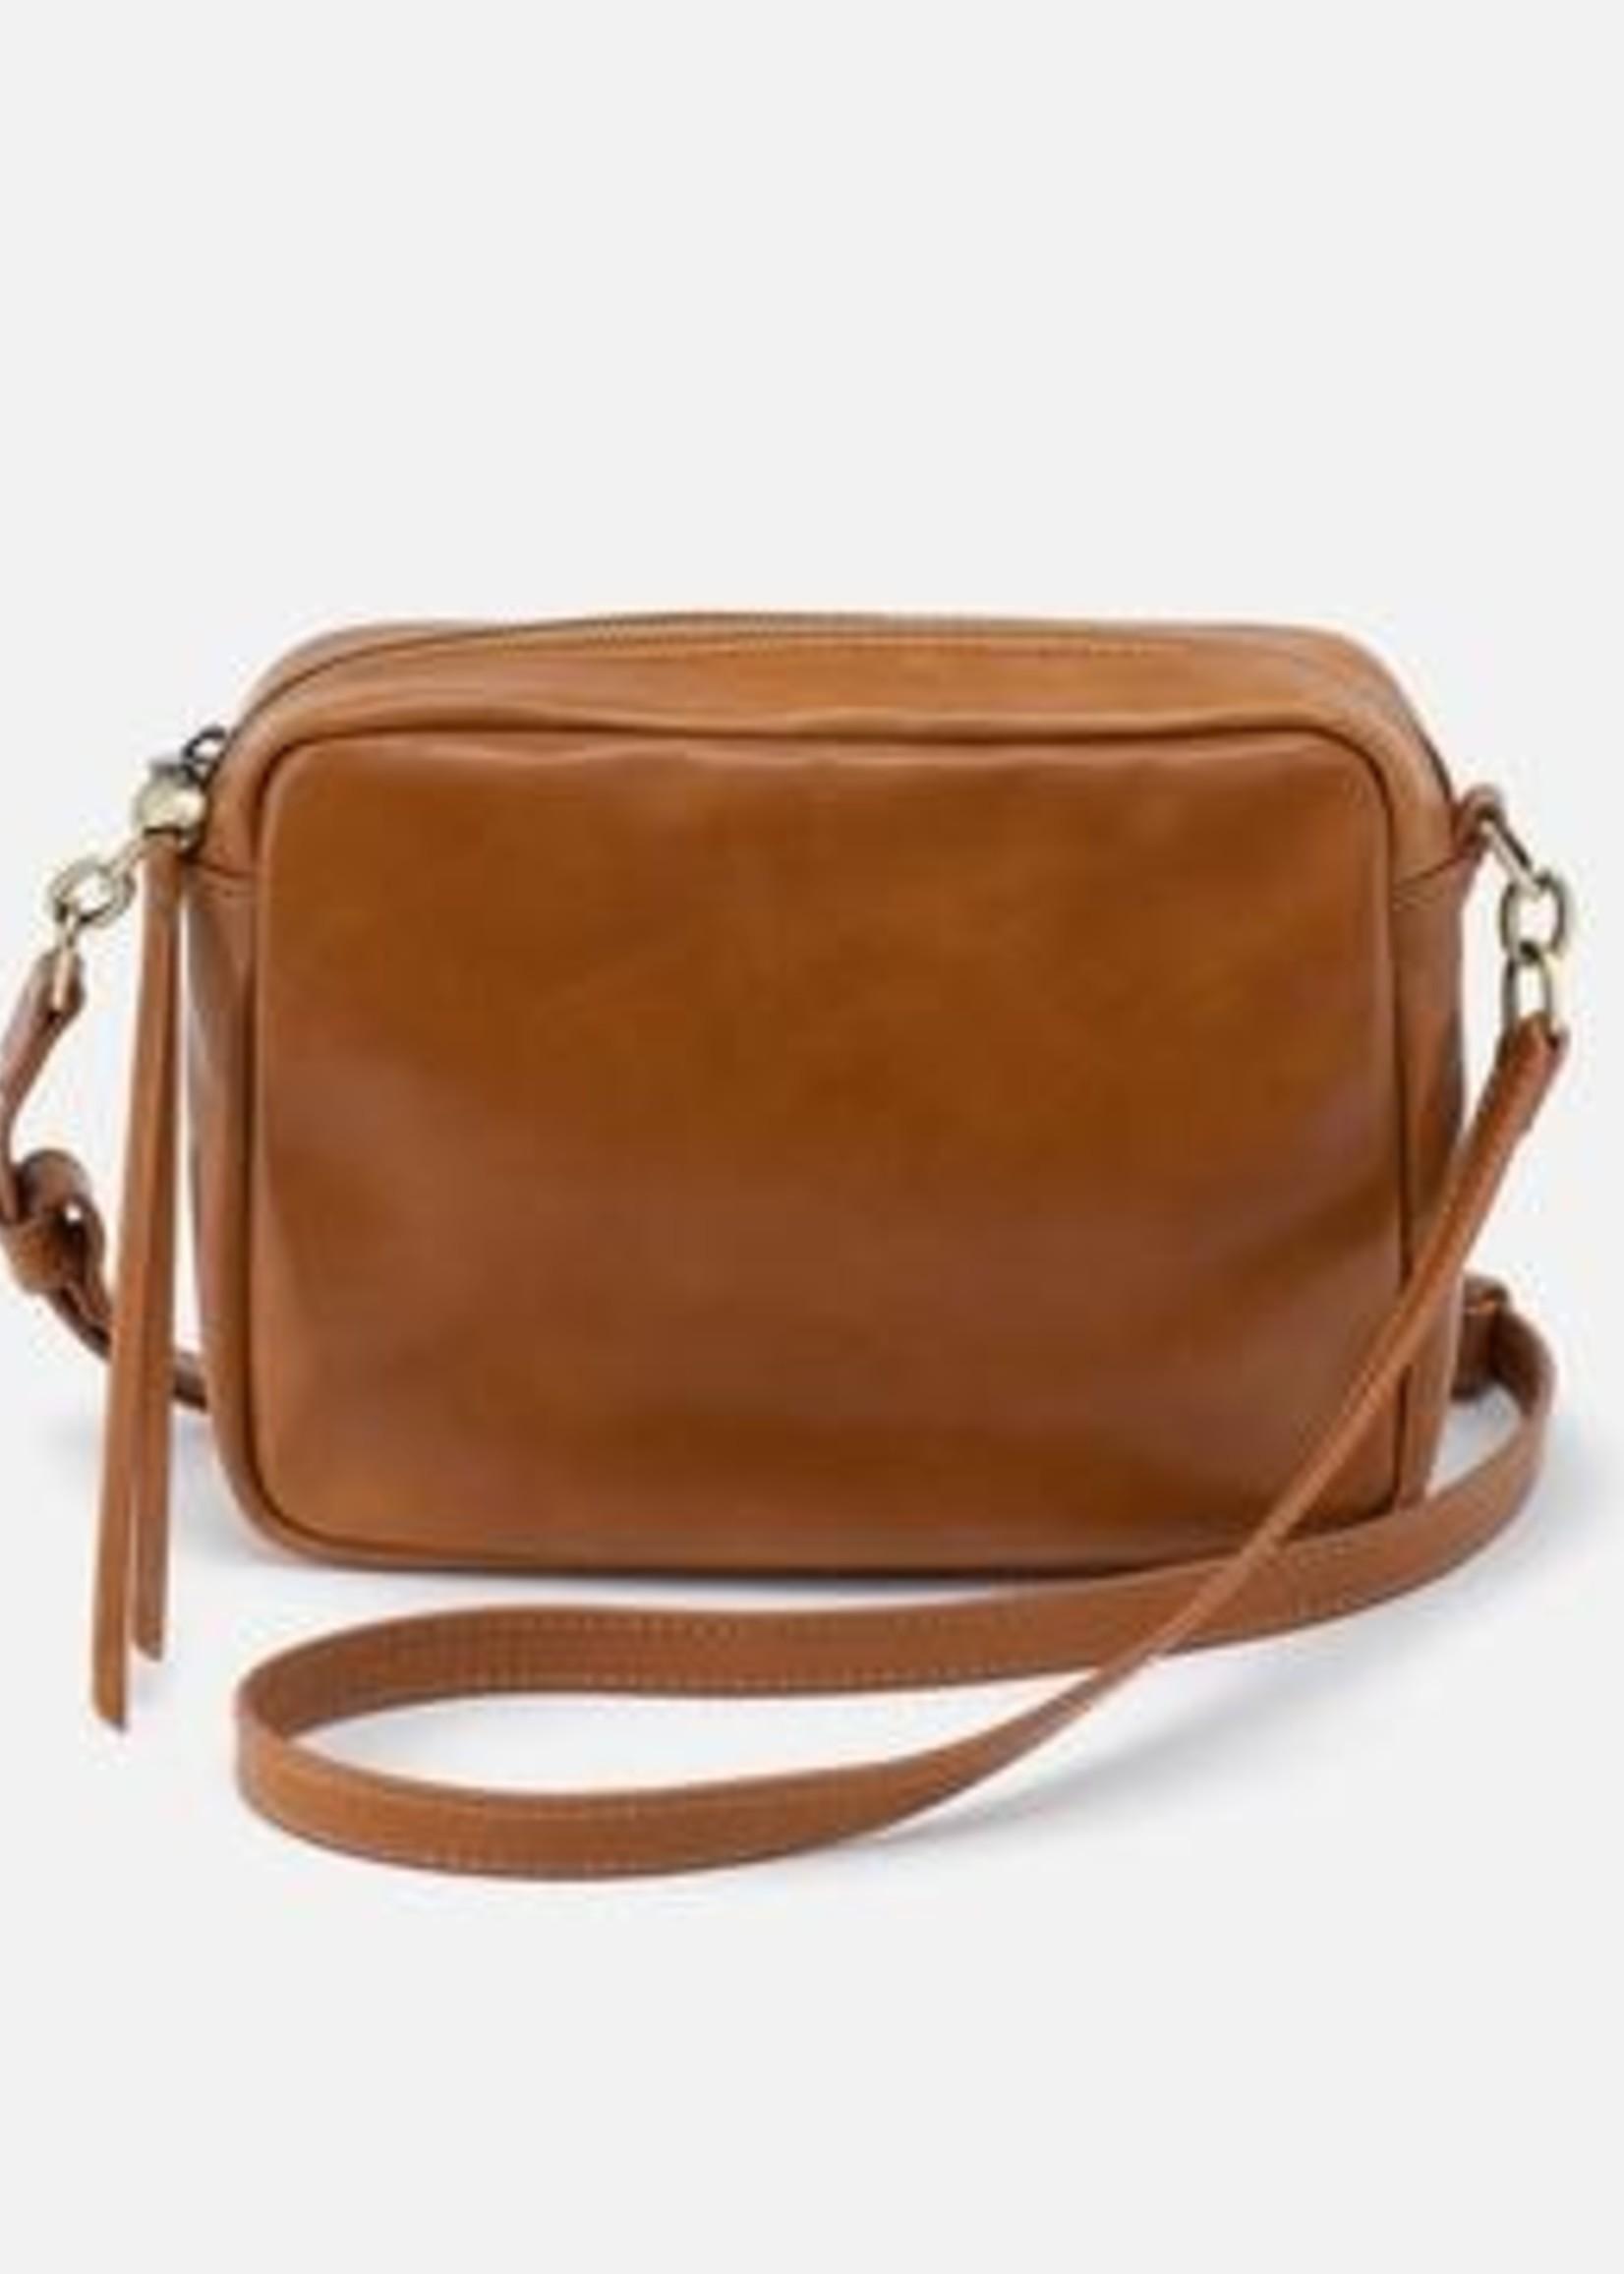 HOBO Bags Renny Crossbody Truffle